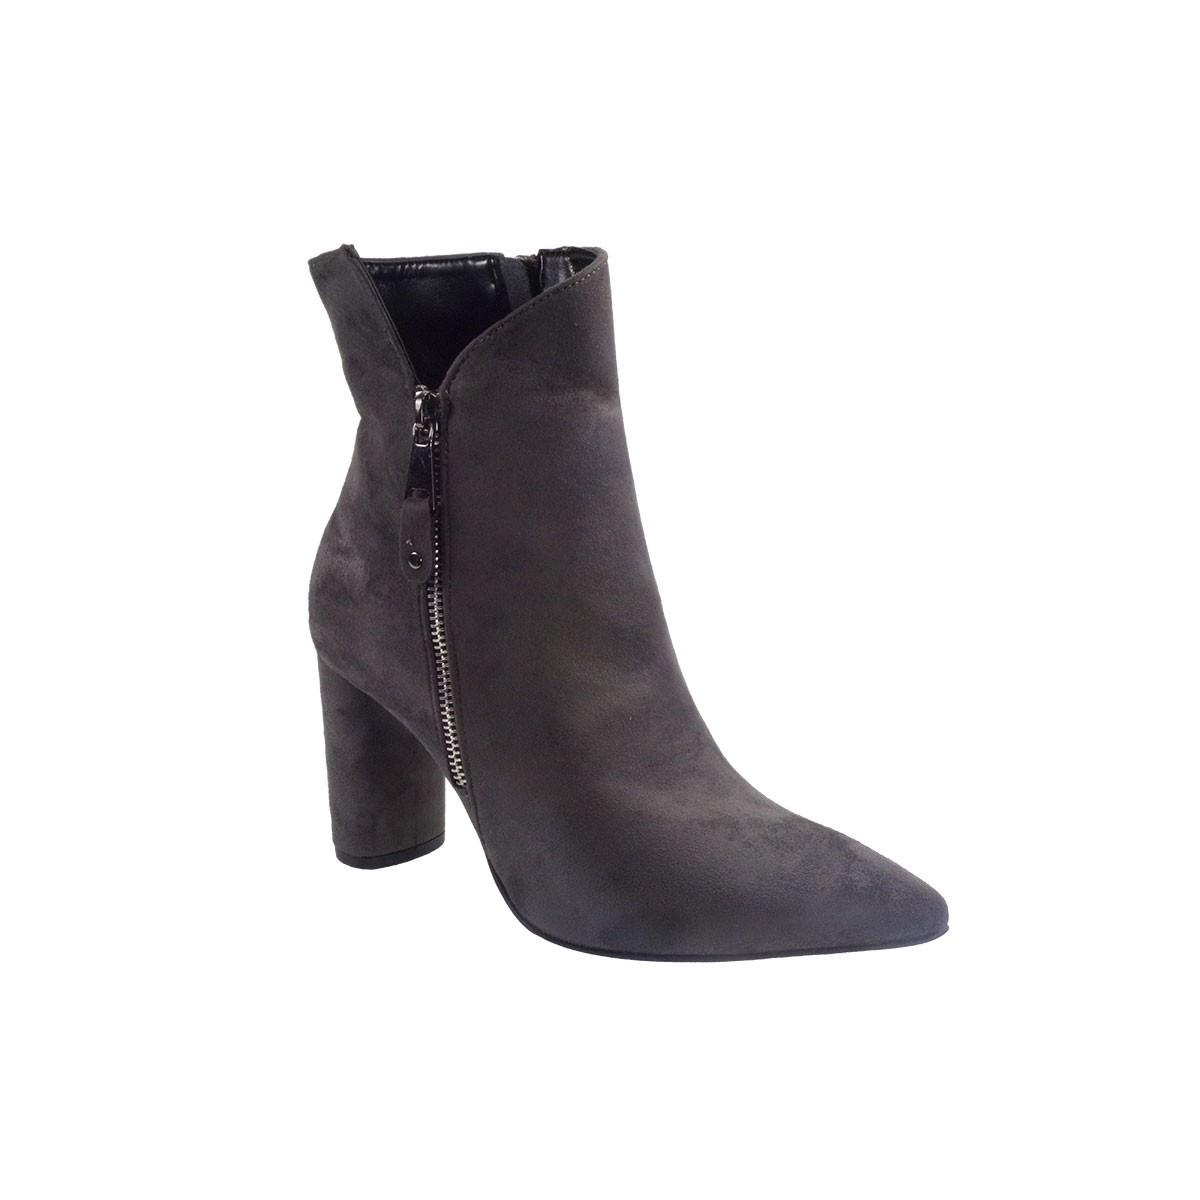 Fardoulis Shoes Γυναικεία Παπούτσια Μποτάκια 4309 Γκρί Λικρα